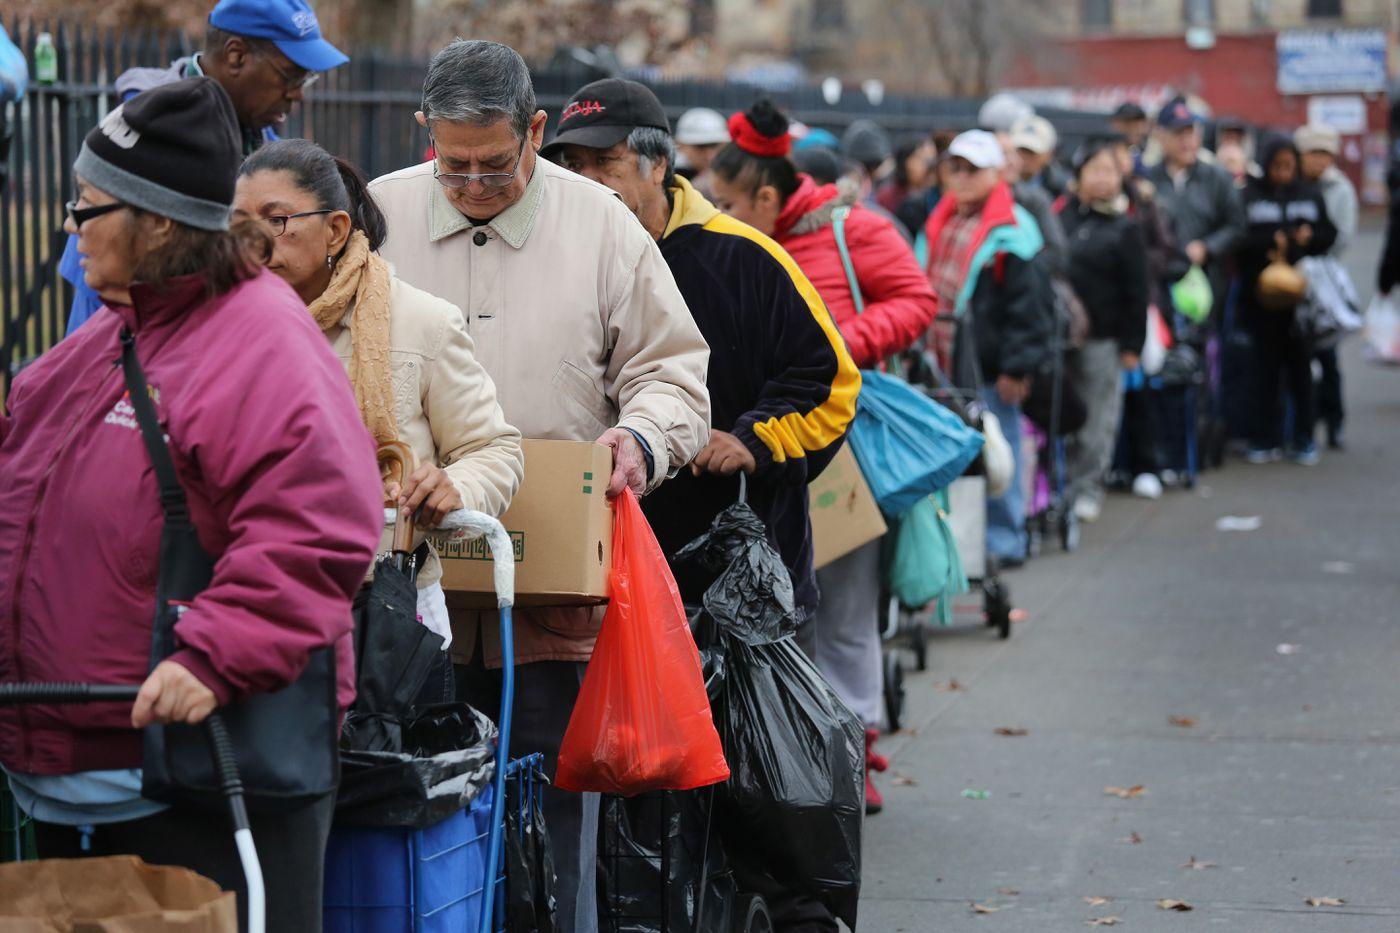 The return of welfare reform - Vox